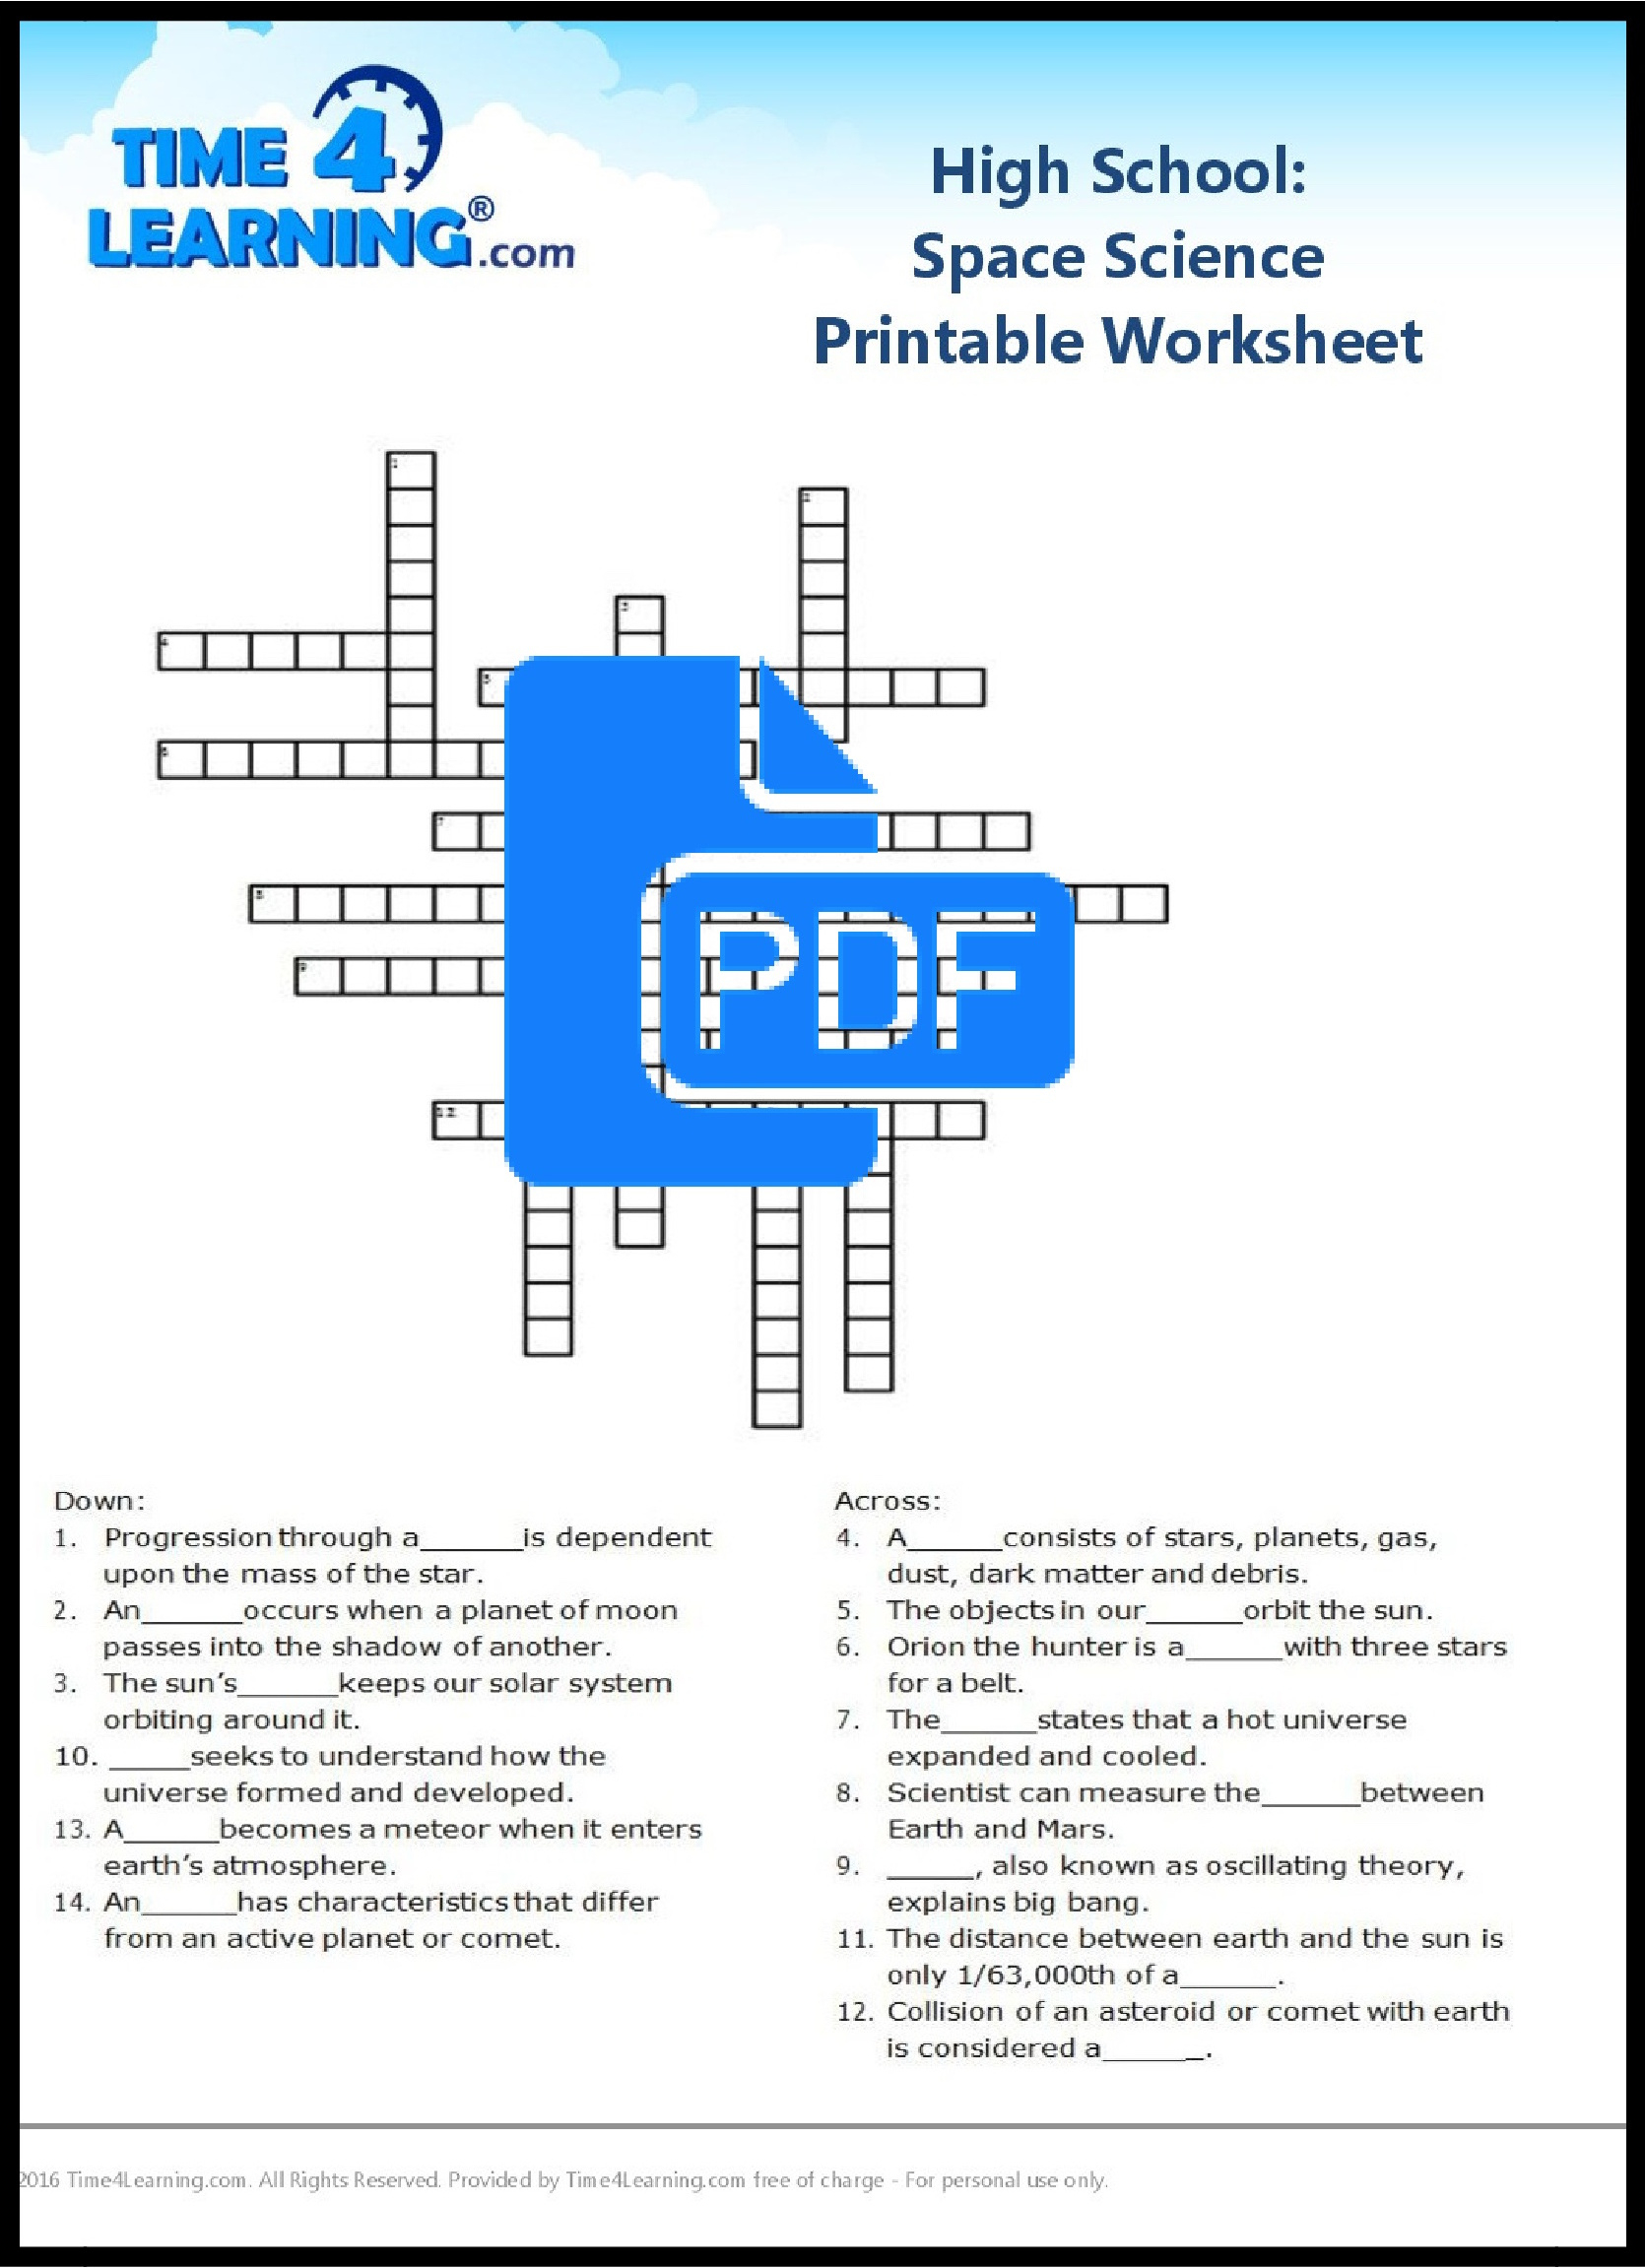 Free Printable: High School Space Science Worksheet | Time4Learning | Printable Science Worksheets